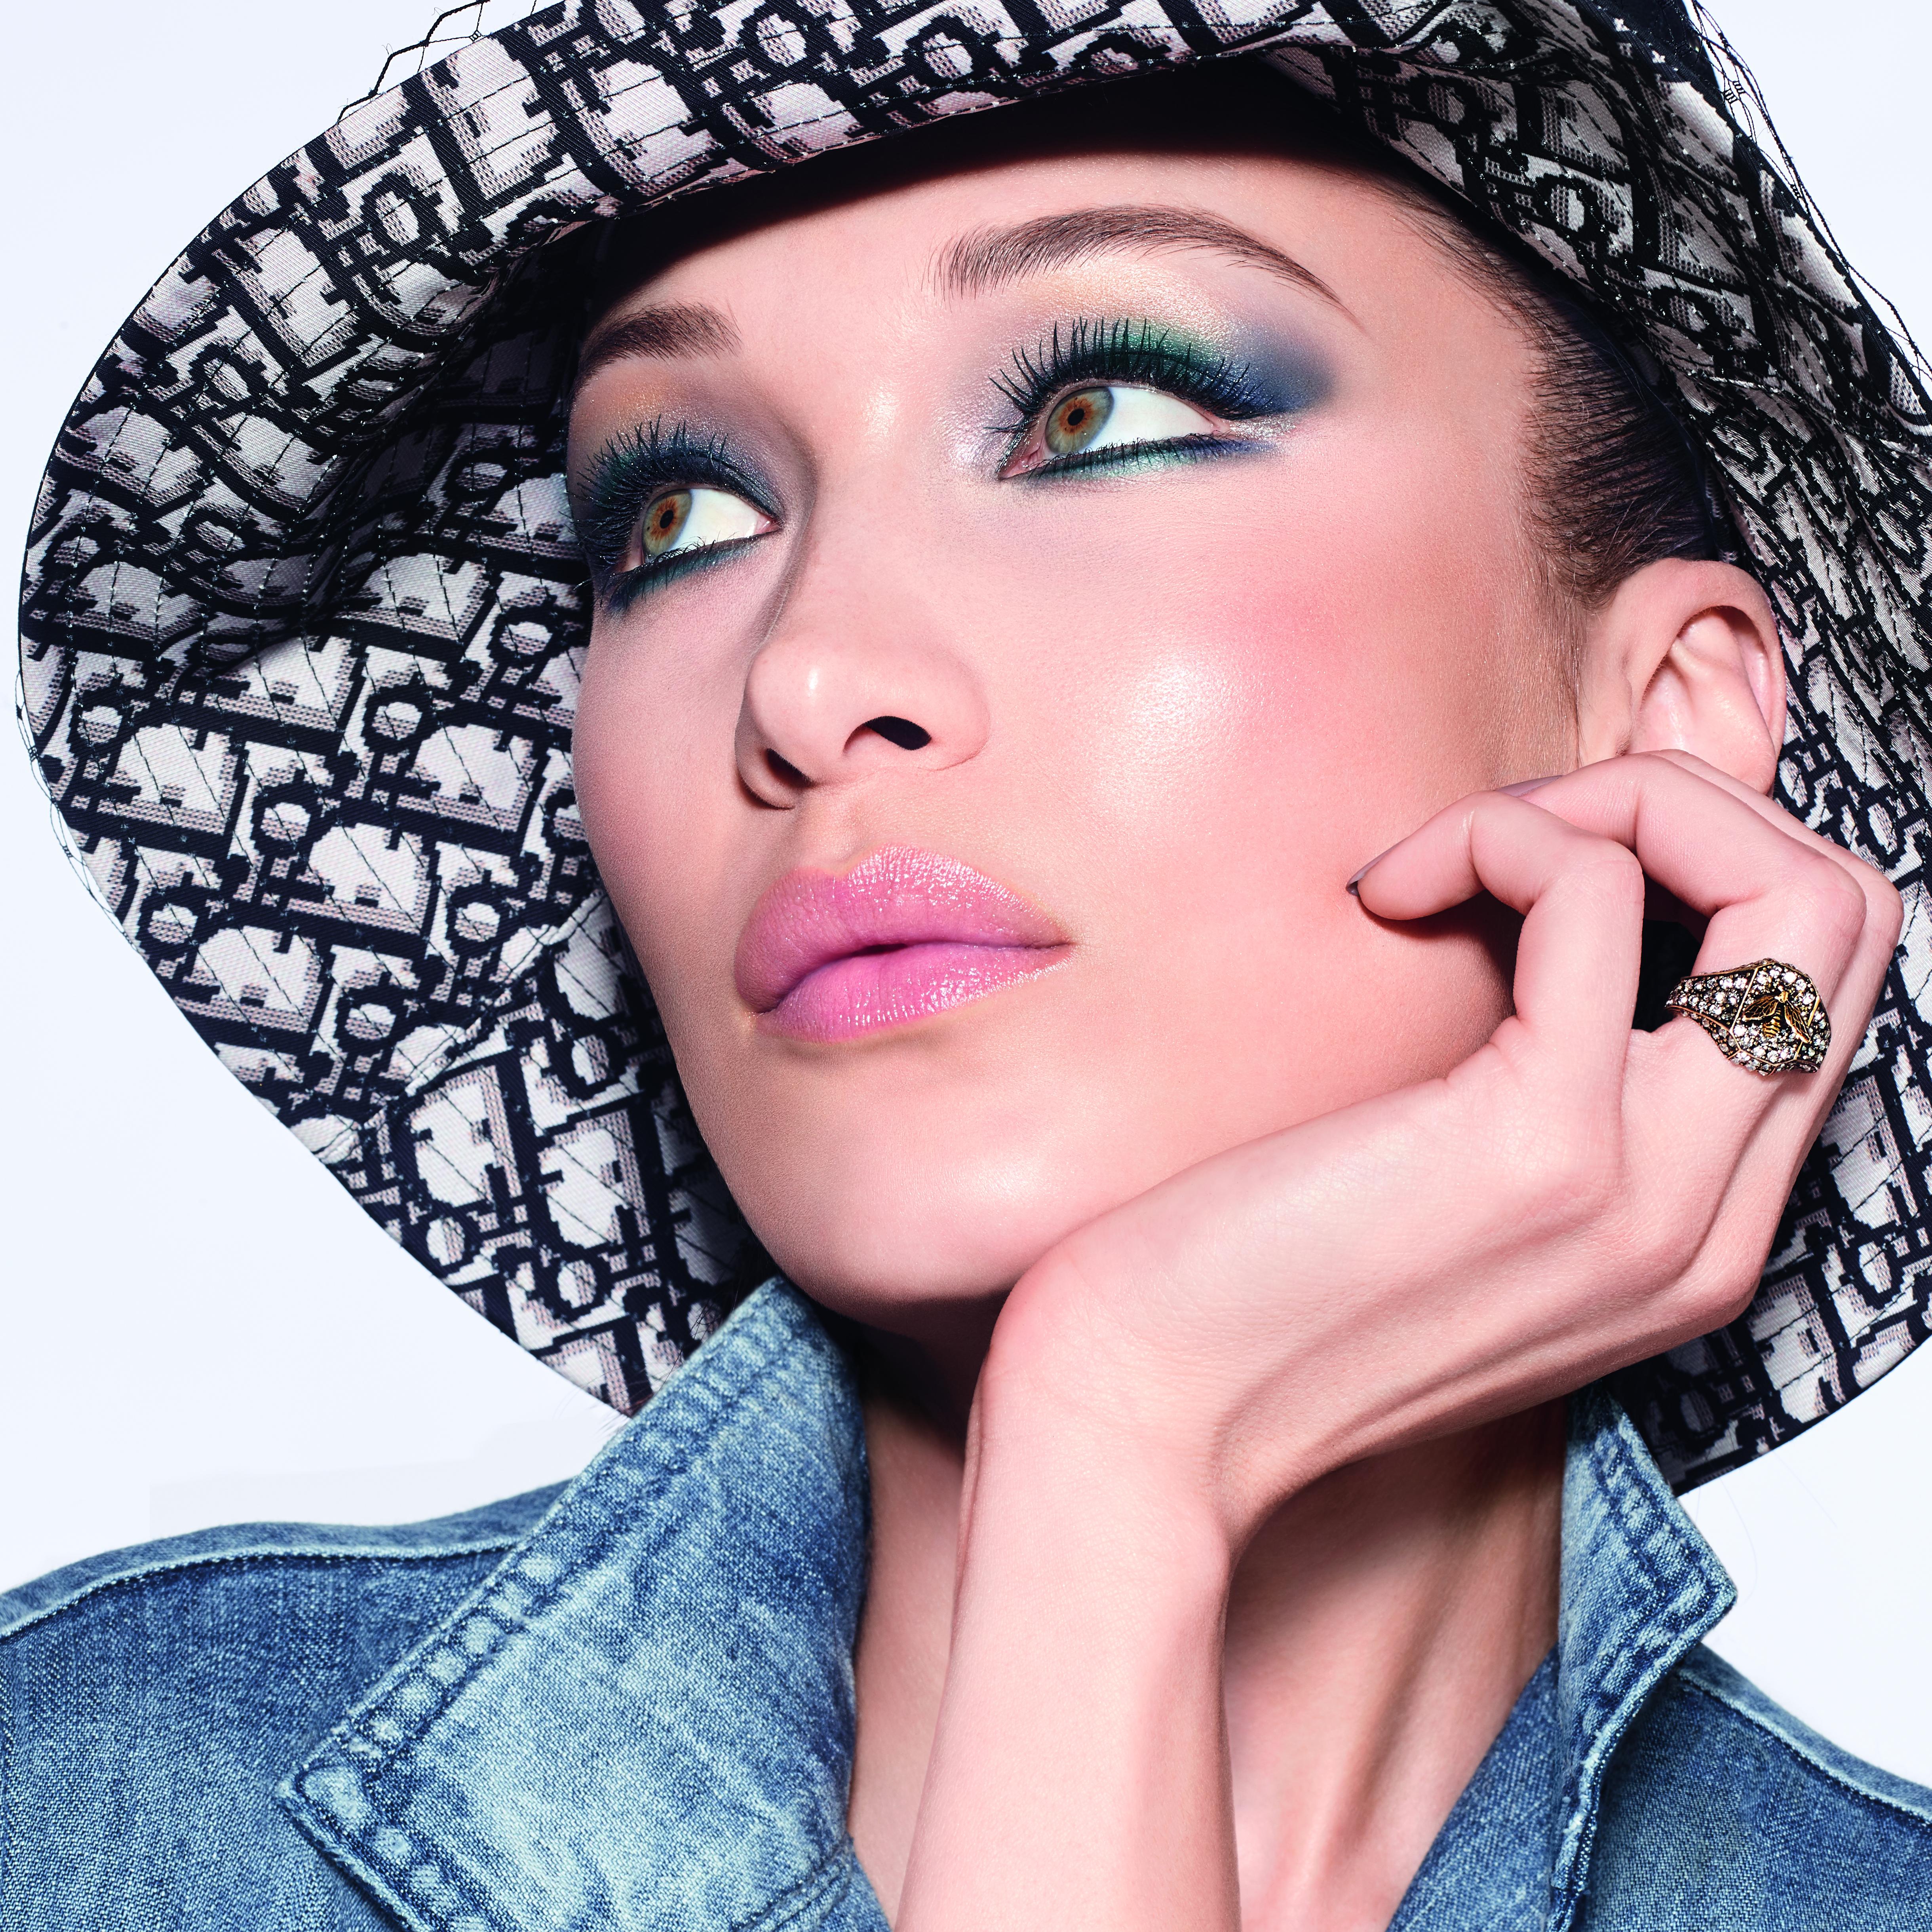 DIOR Diorshow Iconic Overcurl Mascara, 694 brown